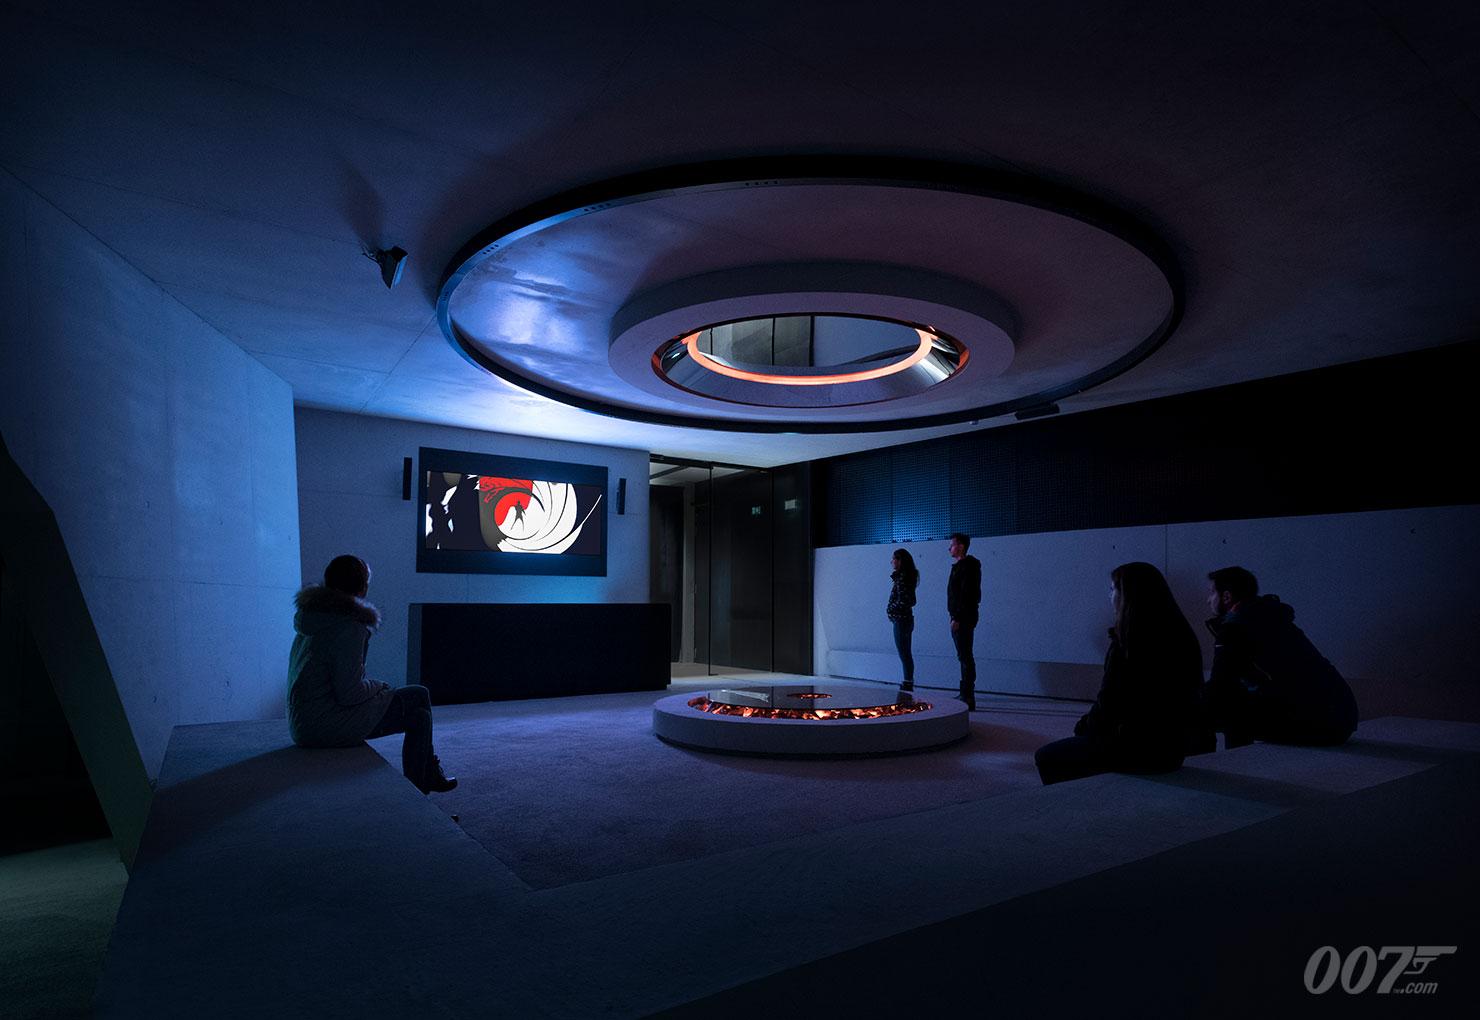 2.-Lobby-007-ELEMENTS-Photo-credit-Kristopher-Grunert_Gallery.jpg